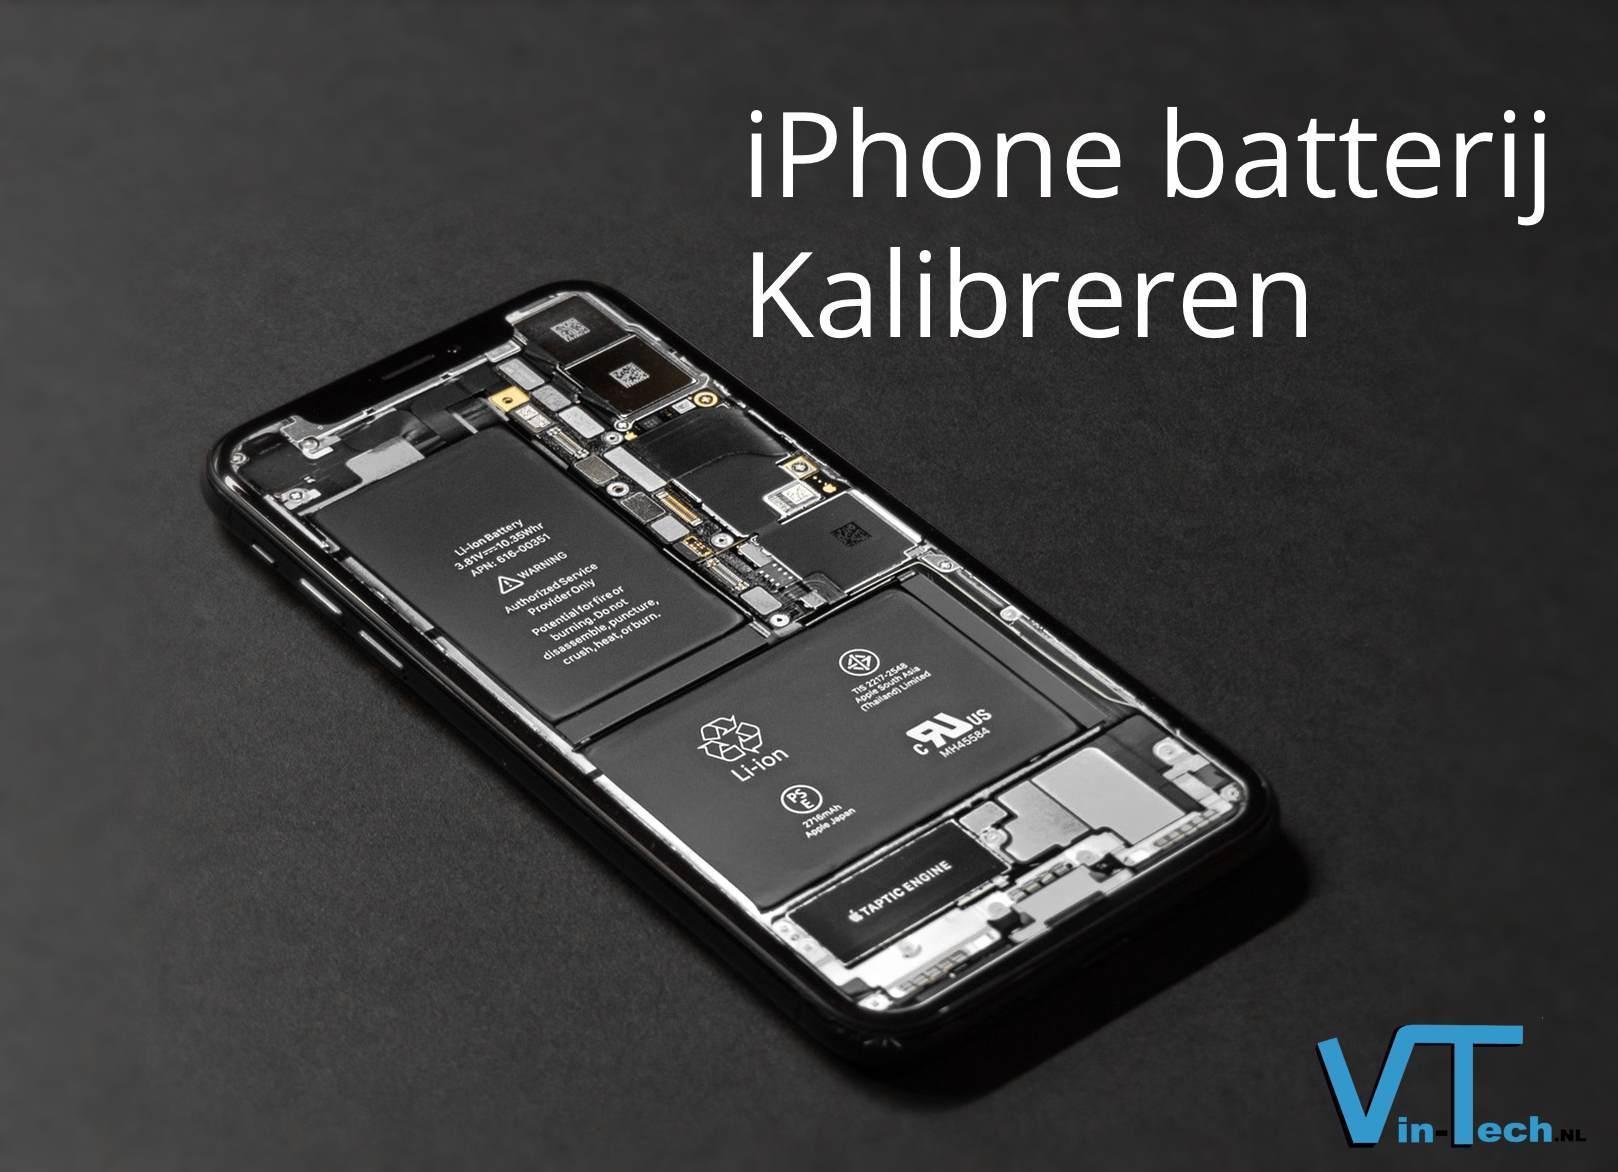 Kalibreer je iPhone batterij, simpel in 4 stappen